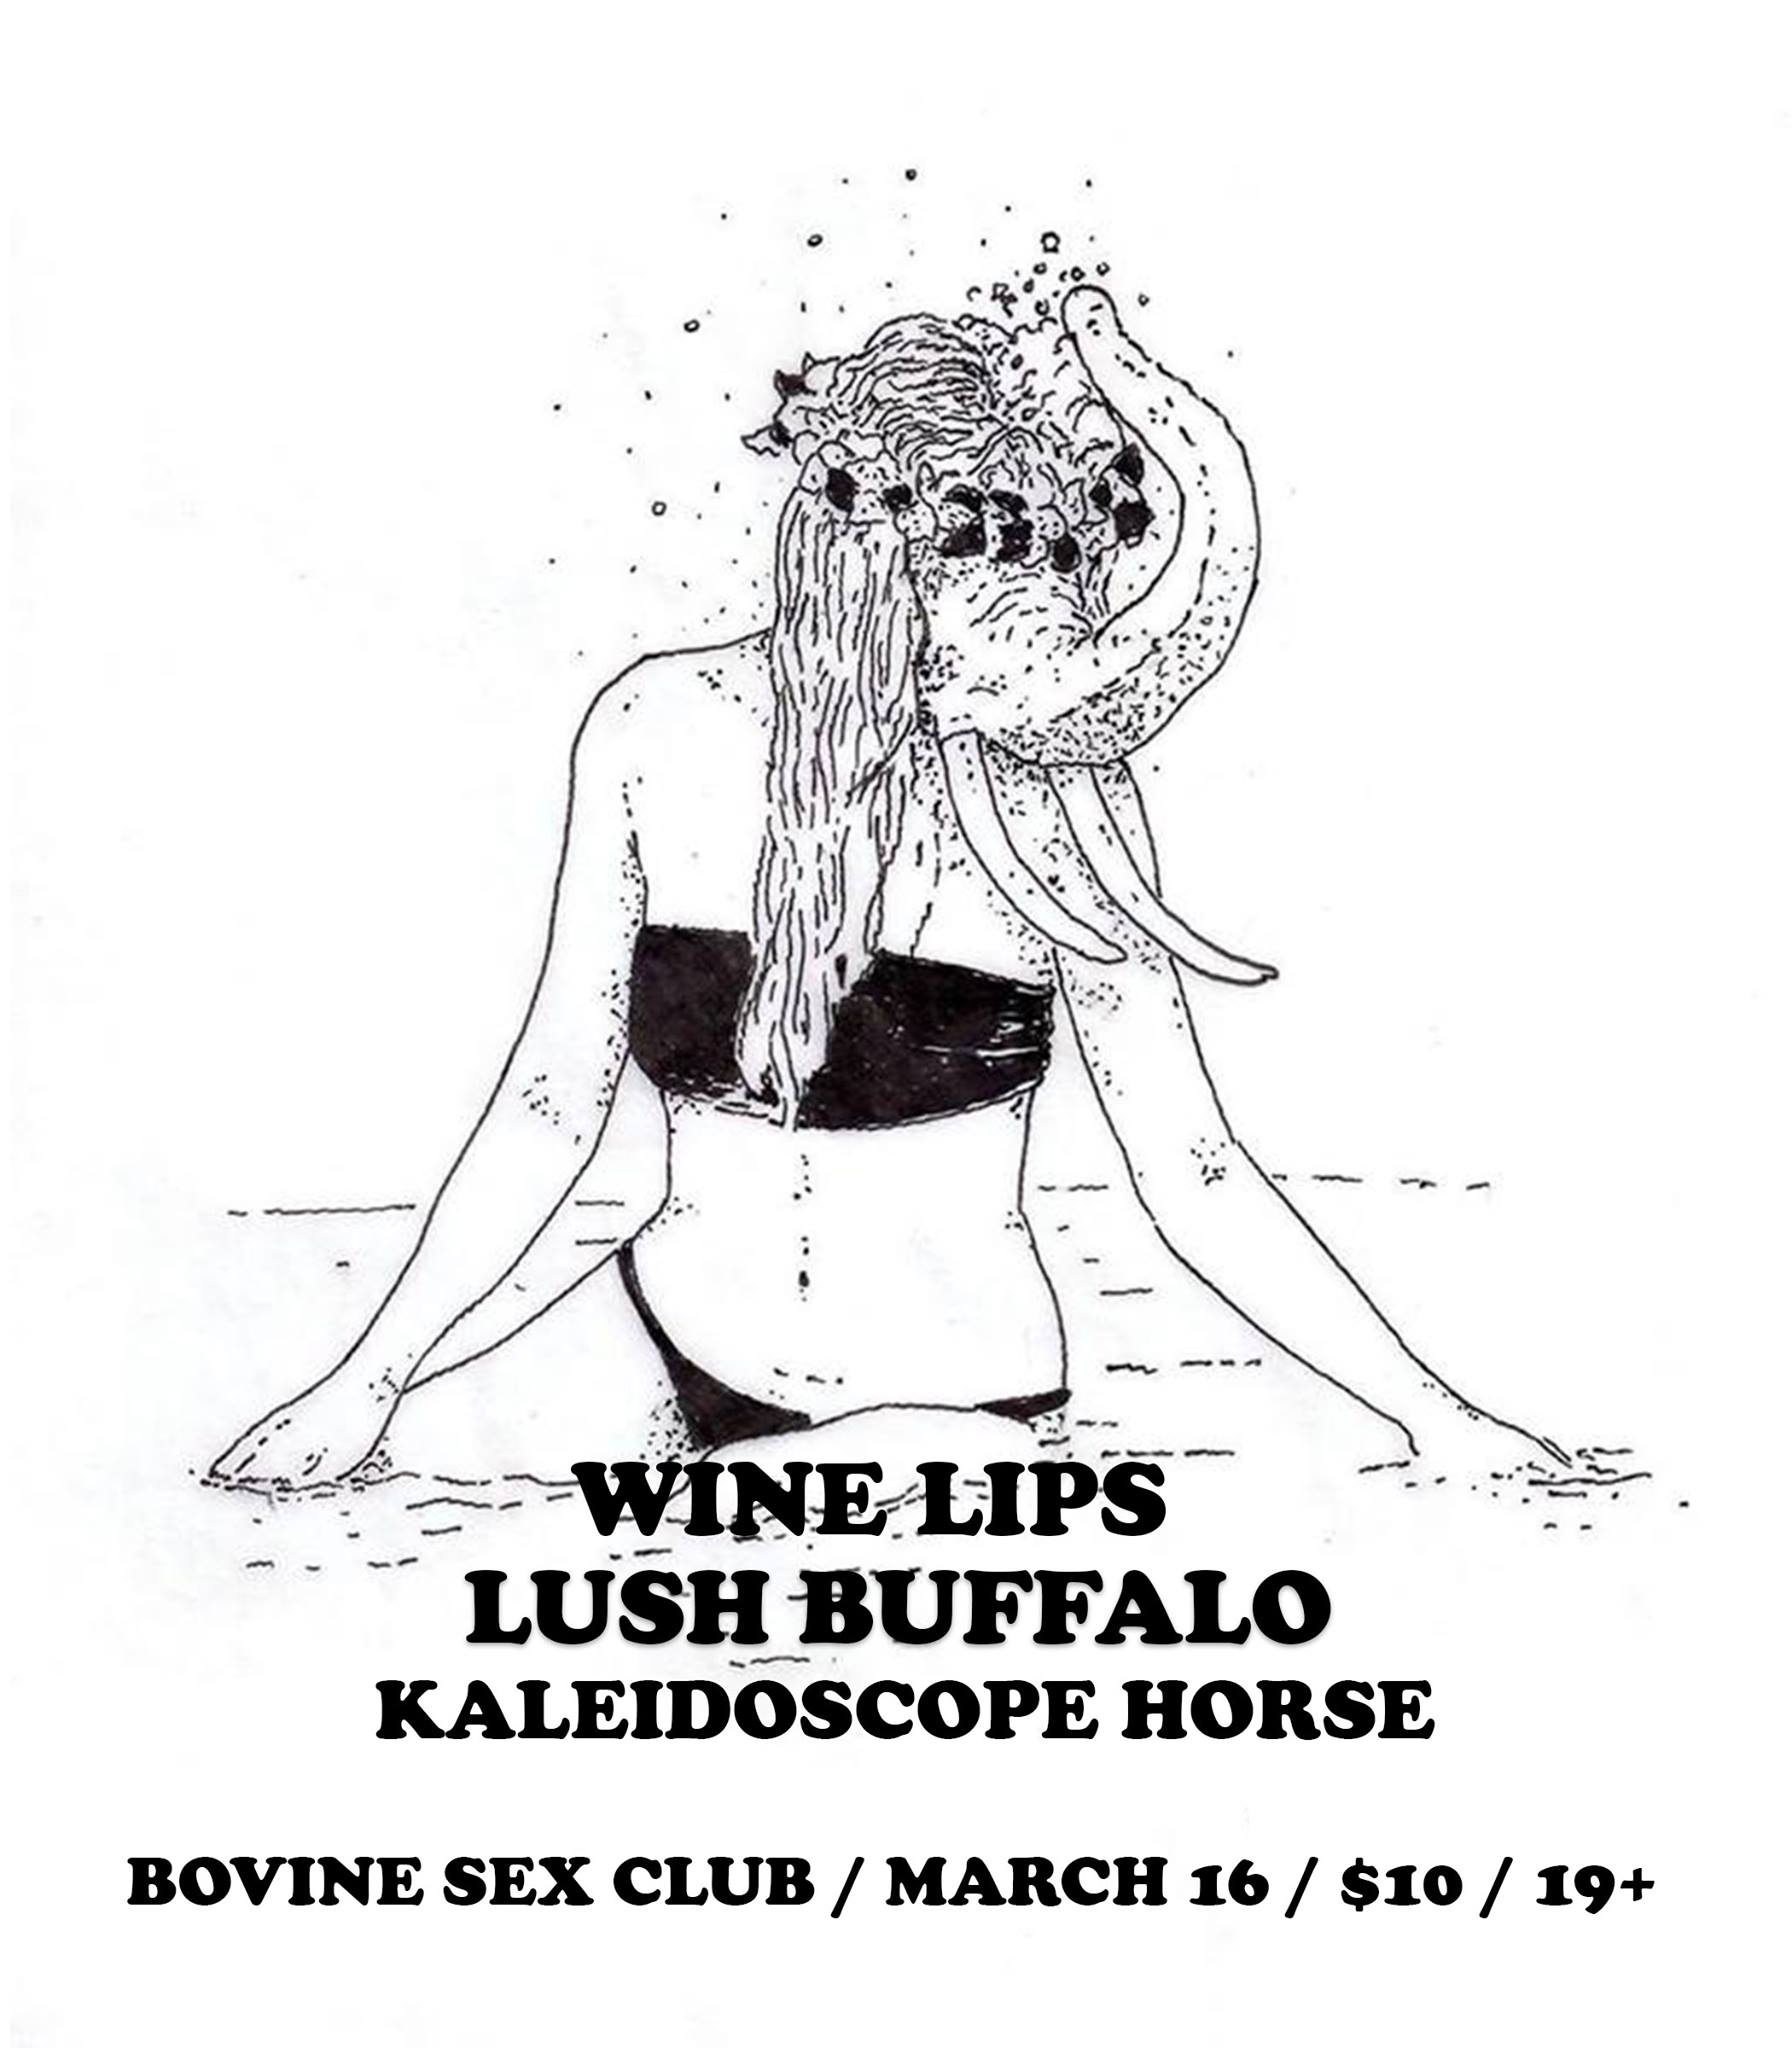 Wine Lips / Lush Buffalo / Kaleidoscope Horse